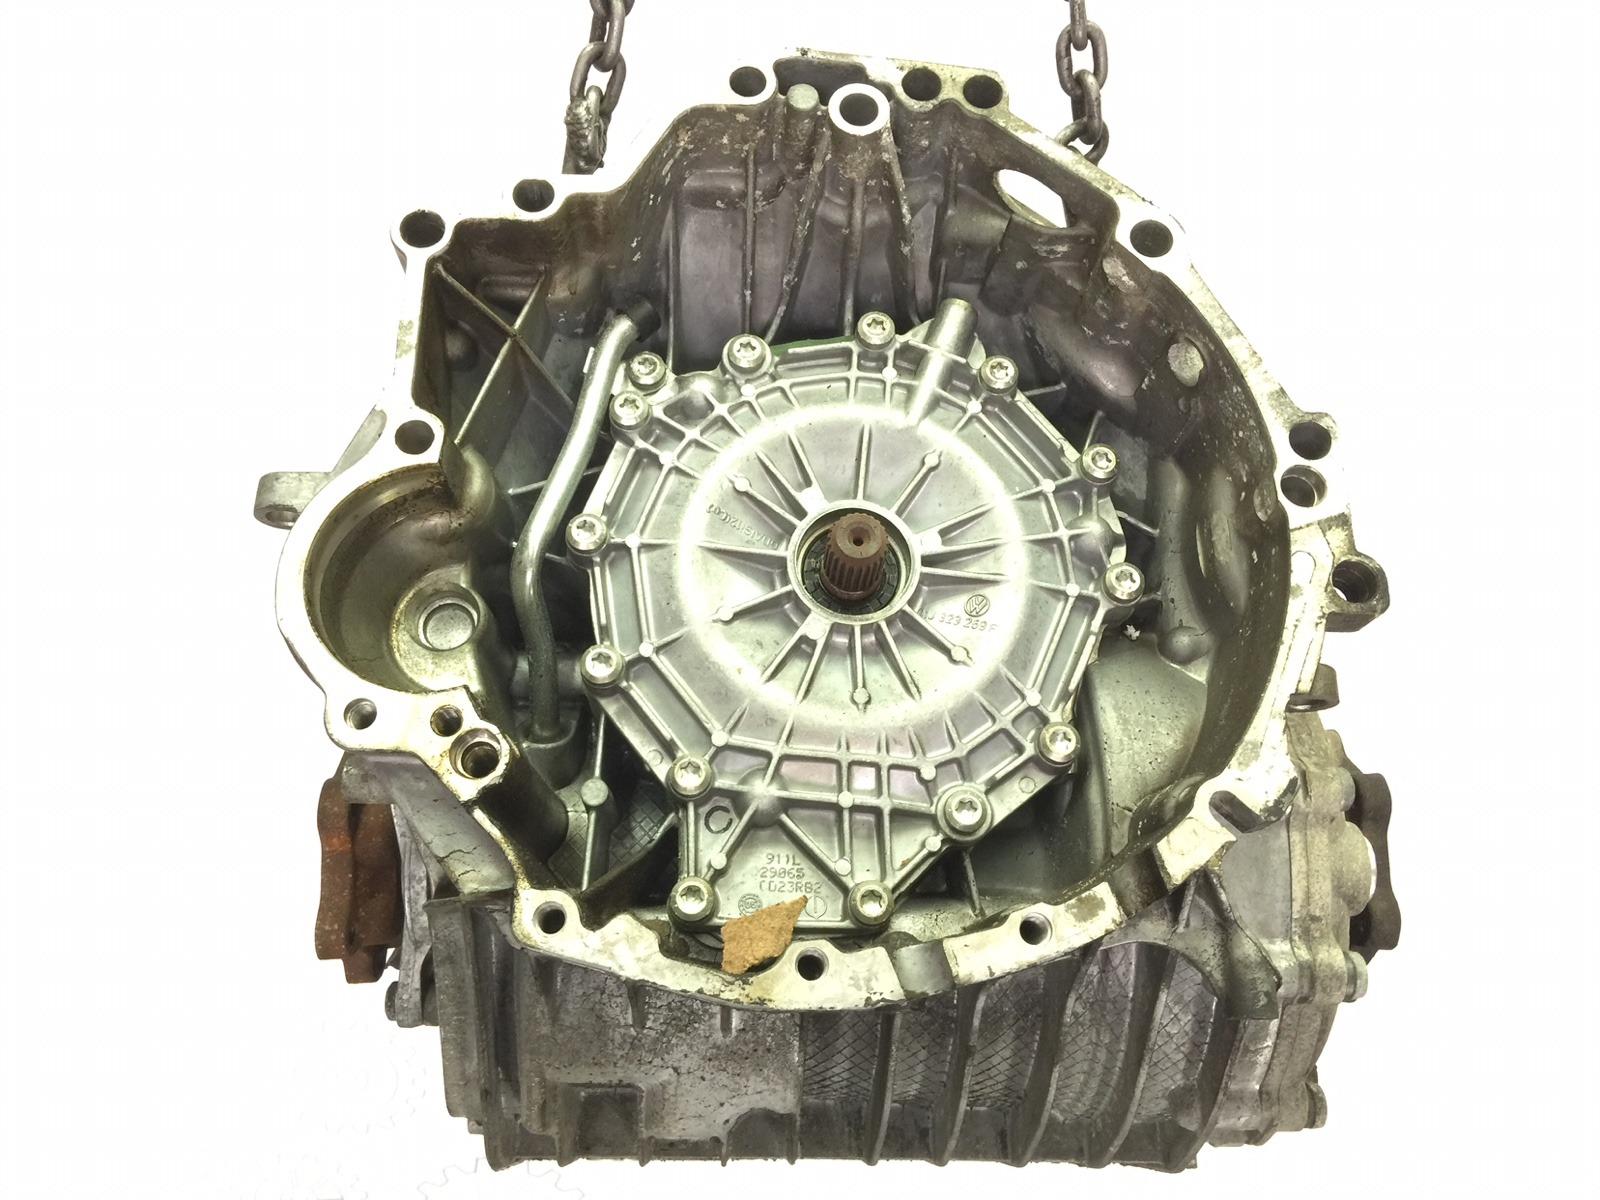 Кпп автоматическая (акпп) Audi A4 B7 1.8 TI 2005 (б/у)